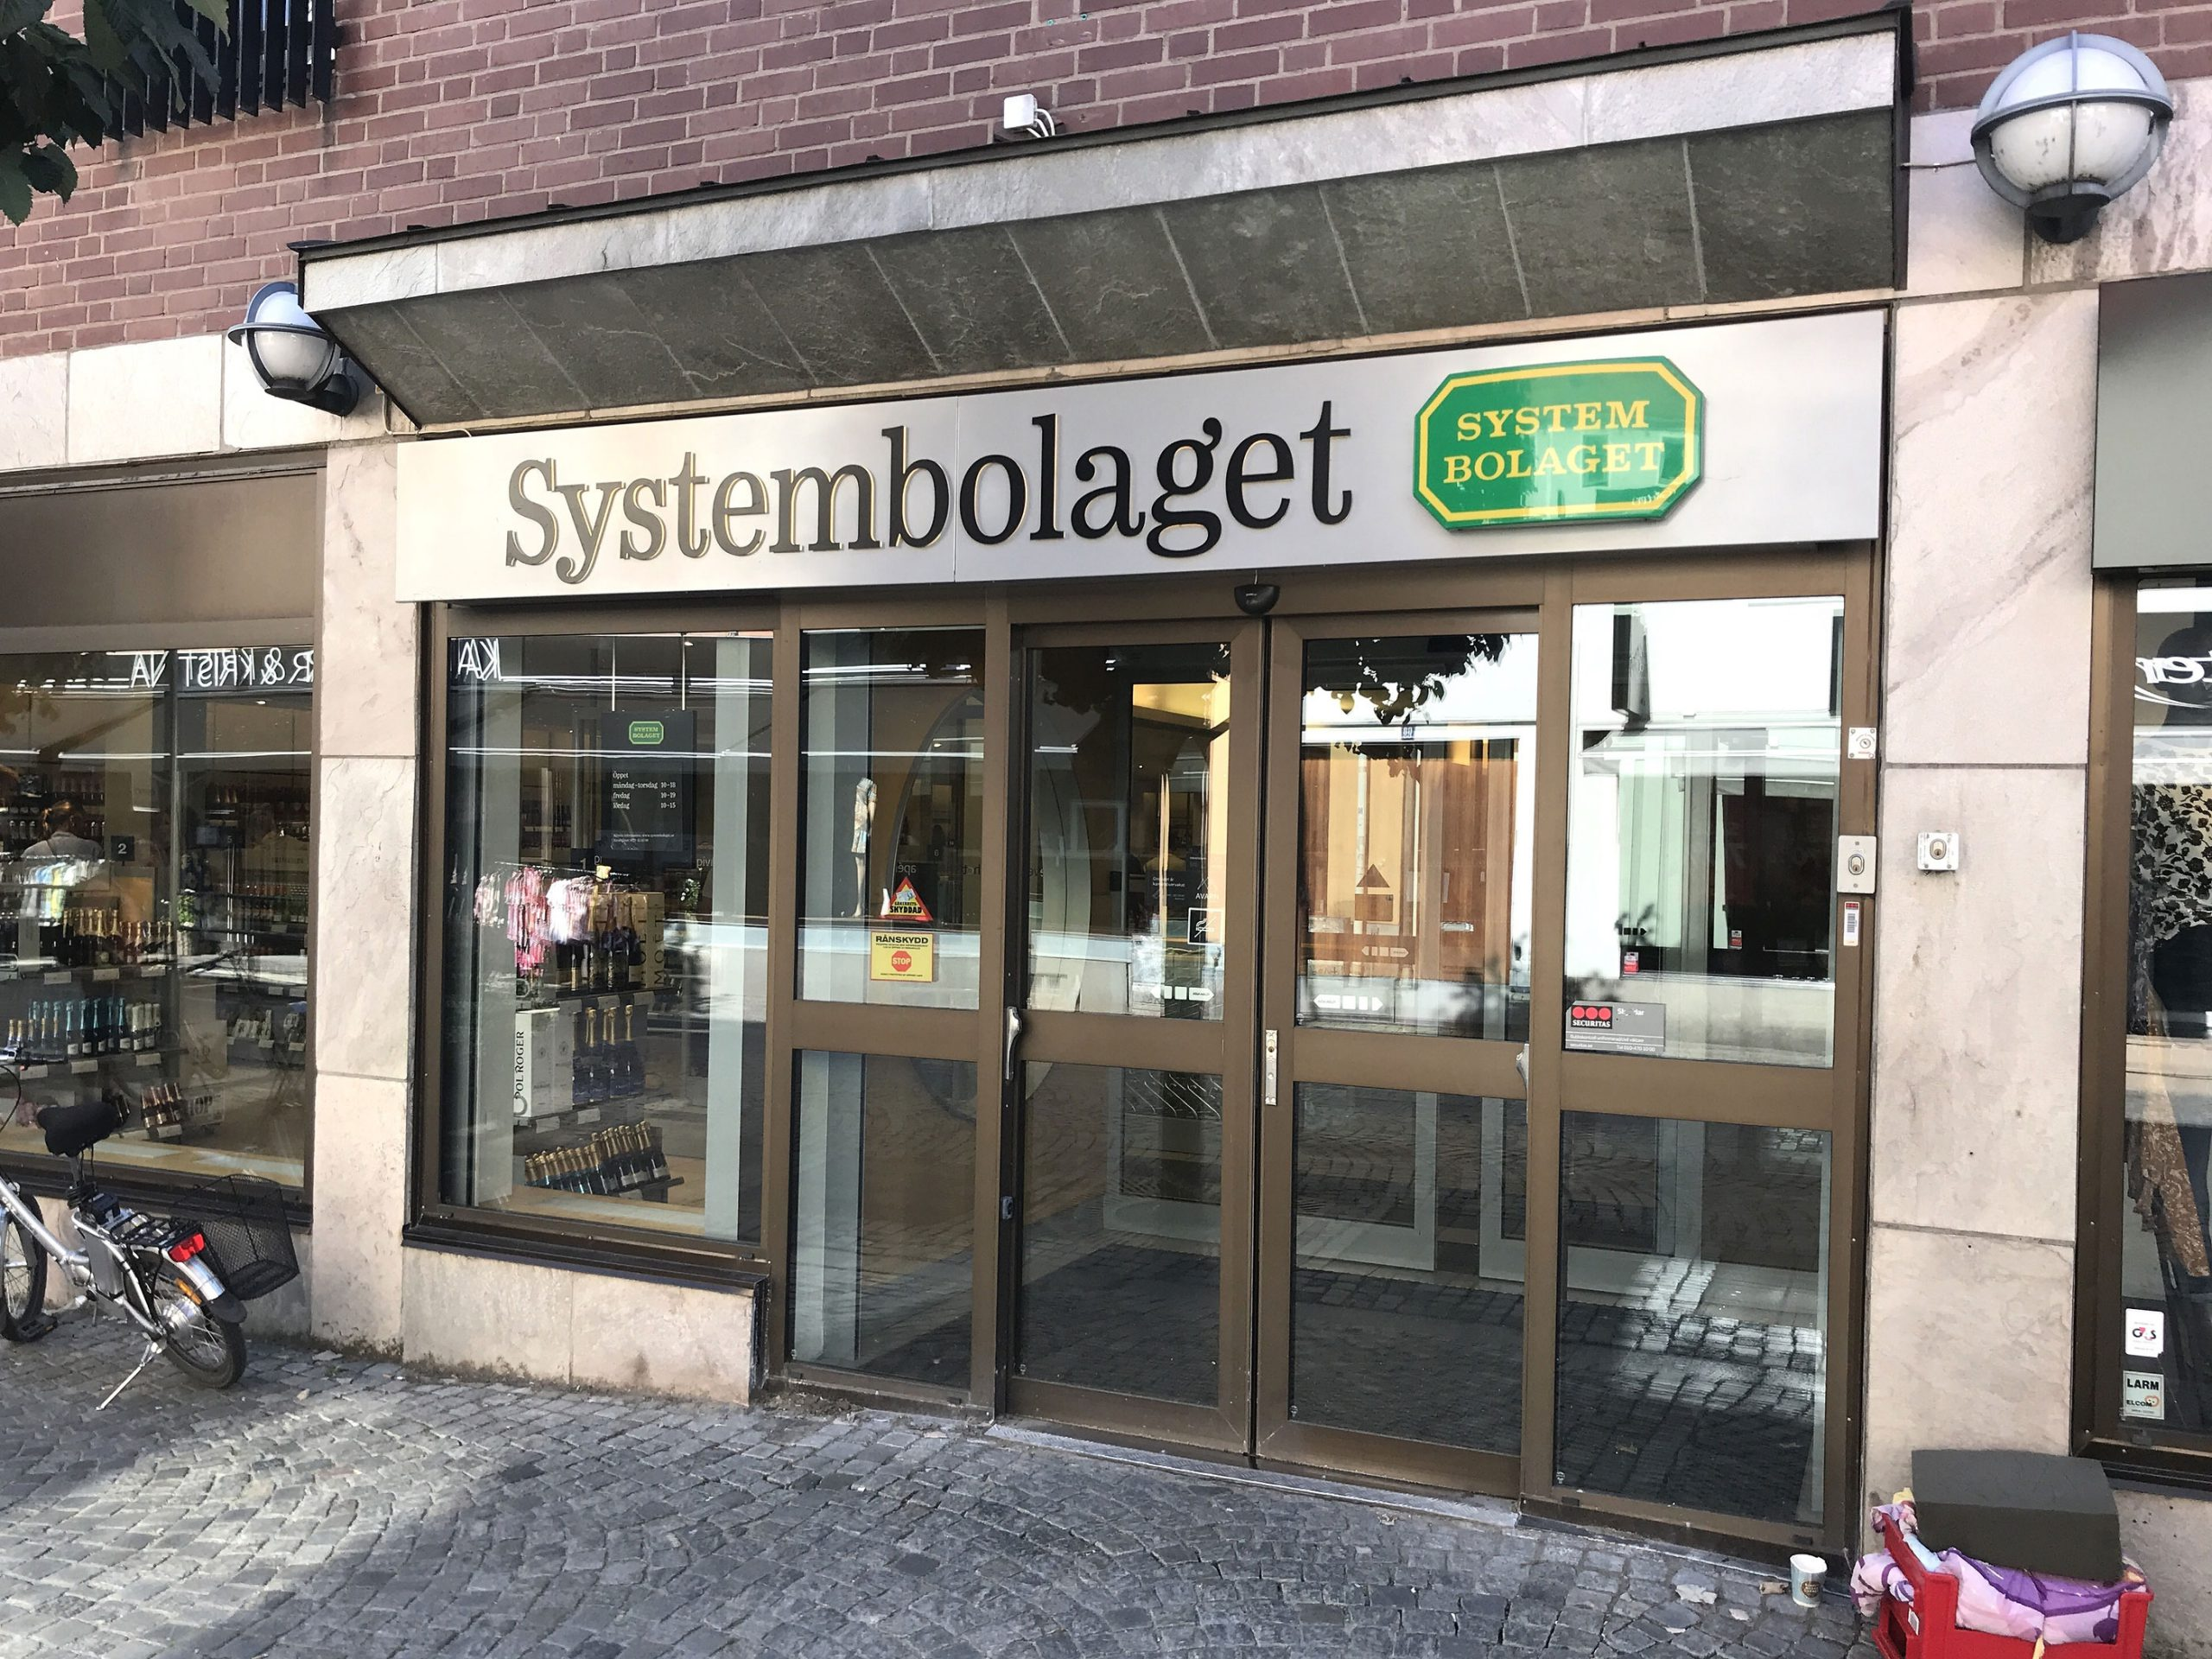 Systembolaget Sverige Stockholm utsalg alkohol vin sprit ol priser